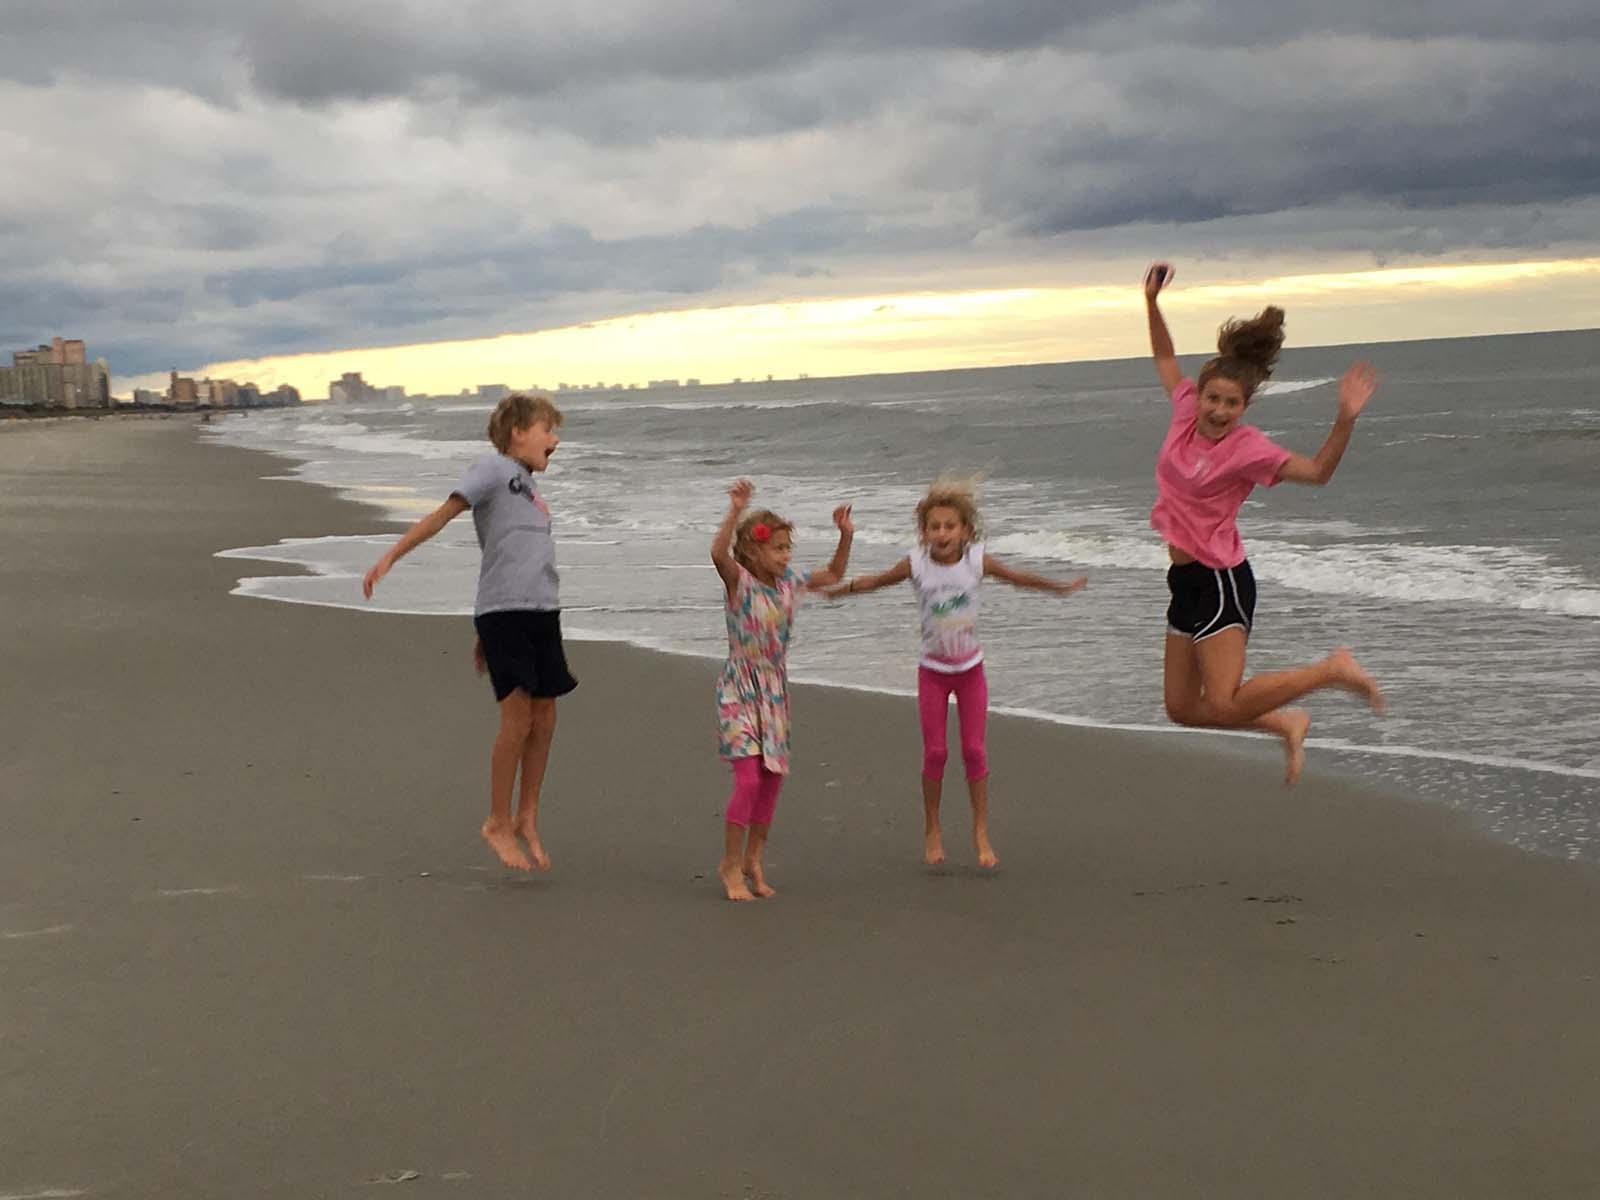 siblings jumping on beach at sunrise